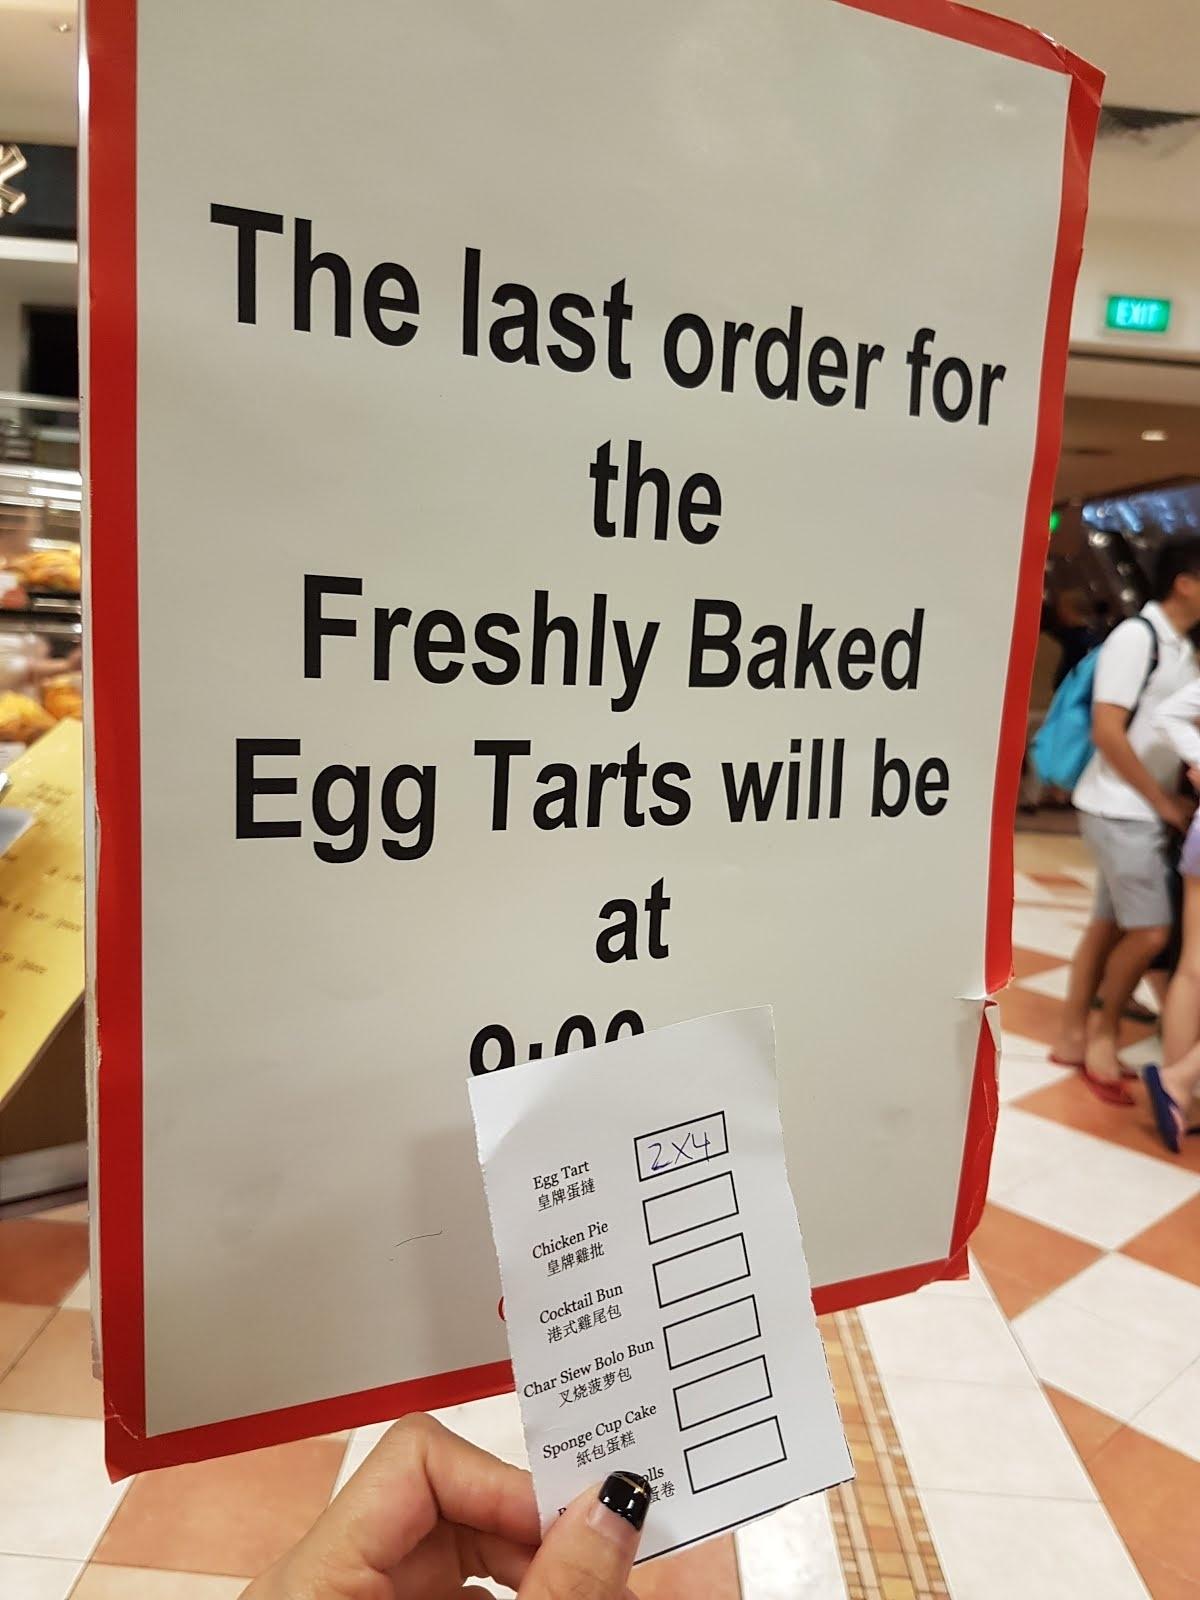 Eats] Warm, Crispy Tai Cheong Egg Tarts ( Takashimaya, Orchard_Tai Cheong Calendar Printing Ltd